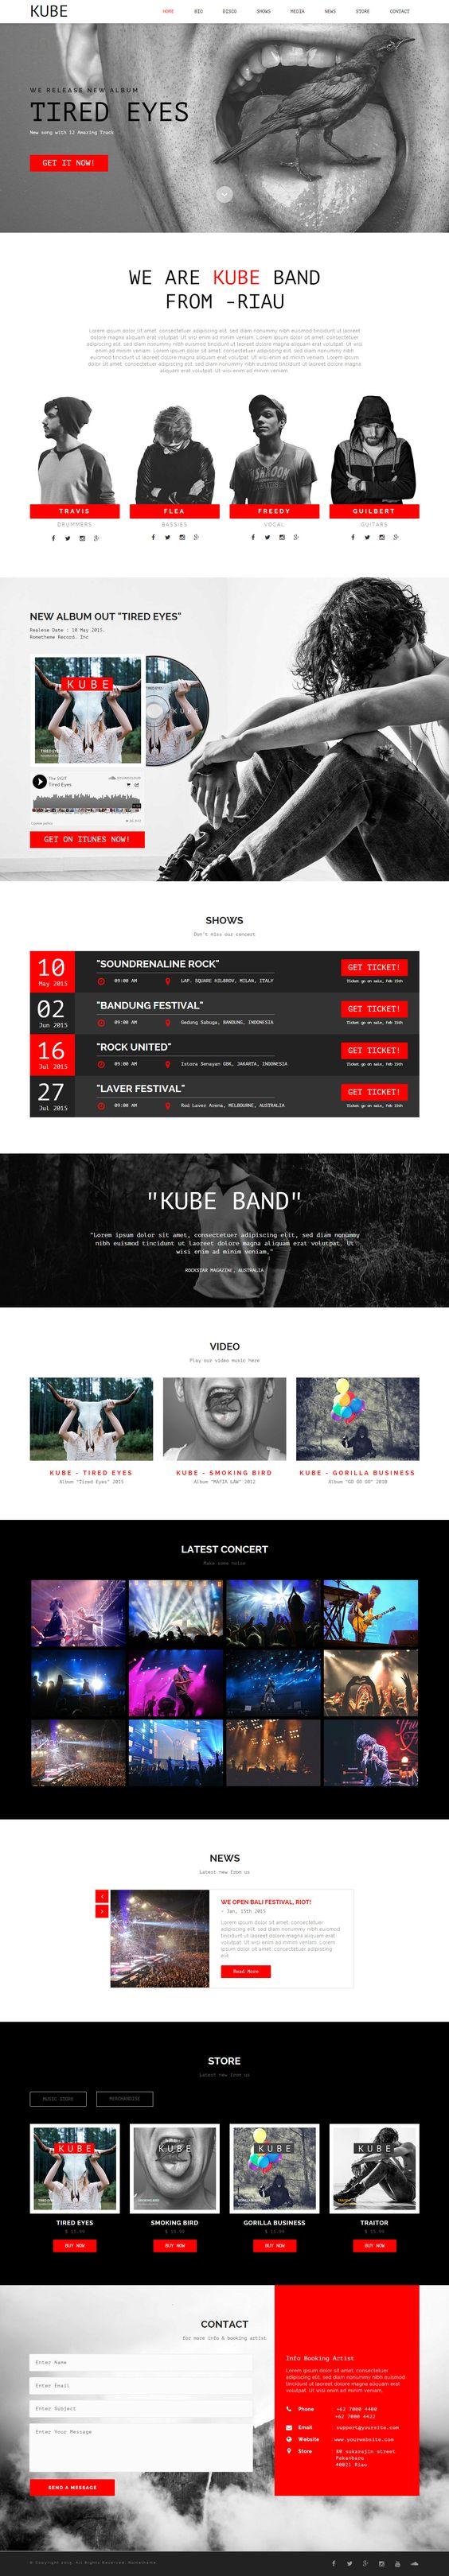 Kube - Musician, DJ, Band, Music #AdobeMuse #Template. Available on #Themeforest #EnvatoMarket by rometheme.net